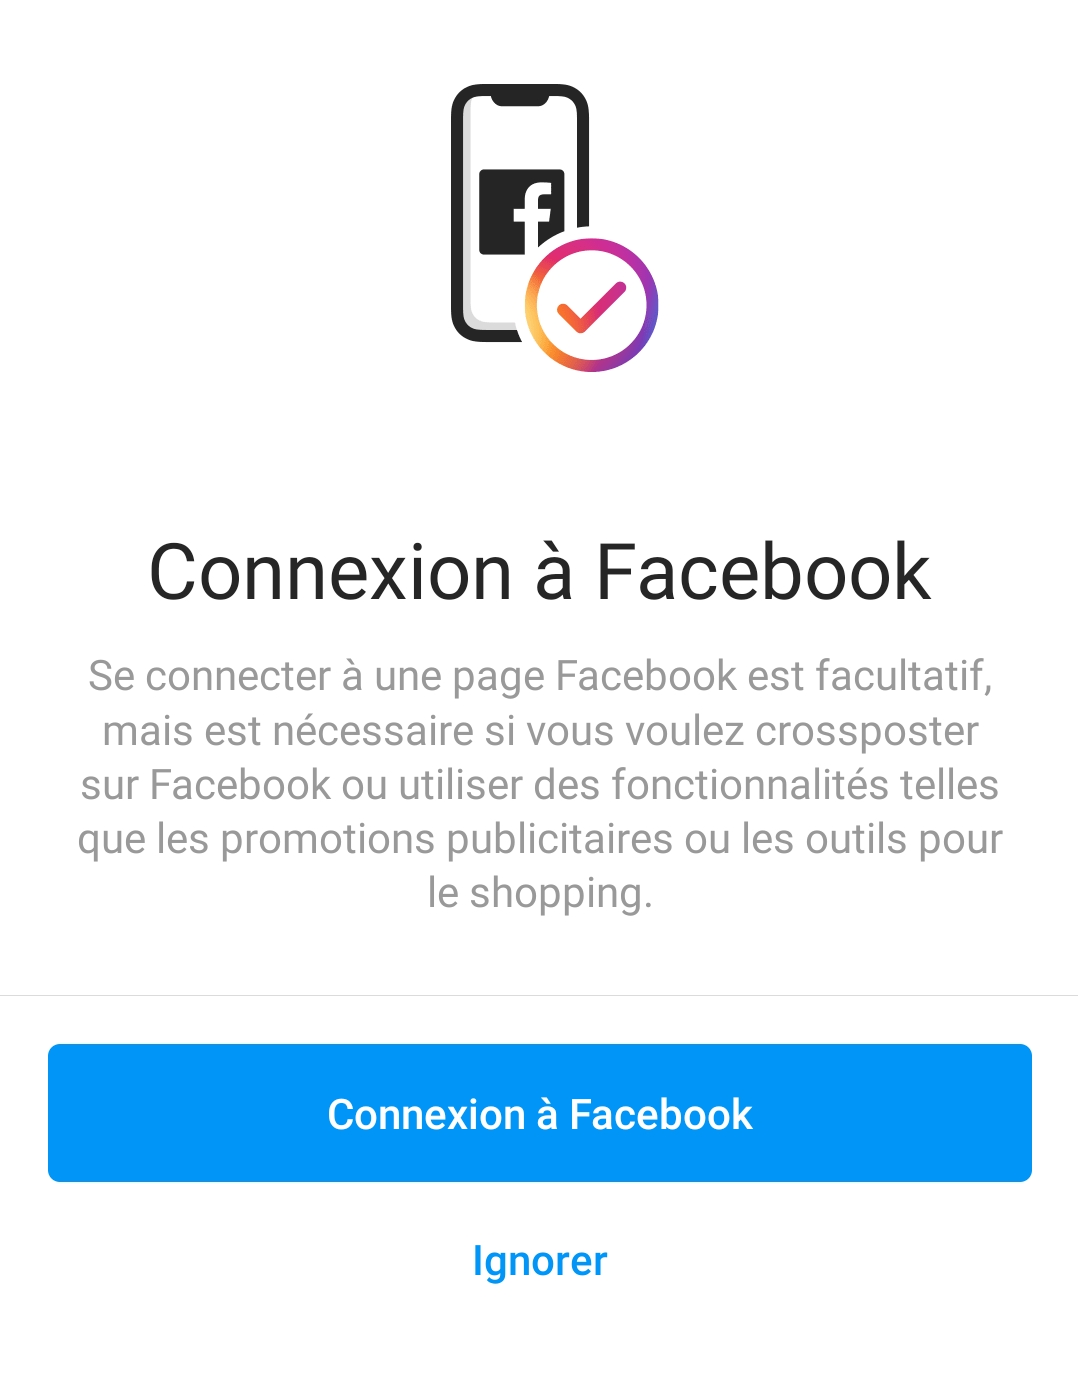 Connexion avec la page Facebook